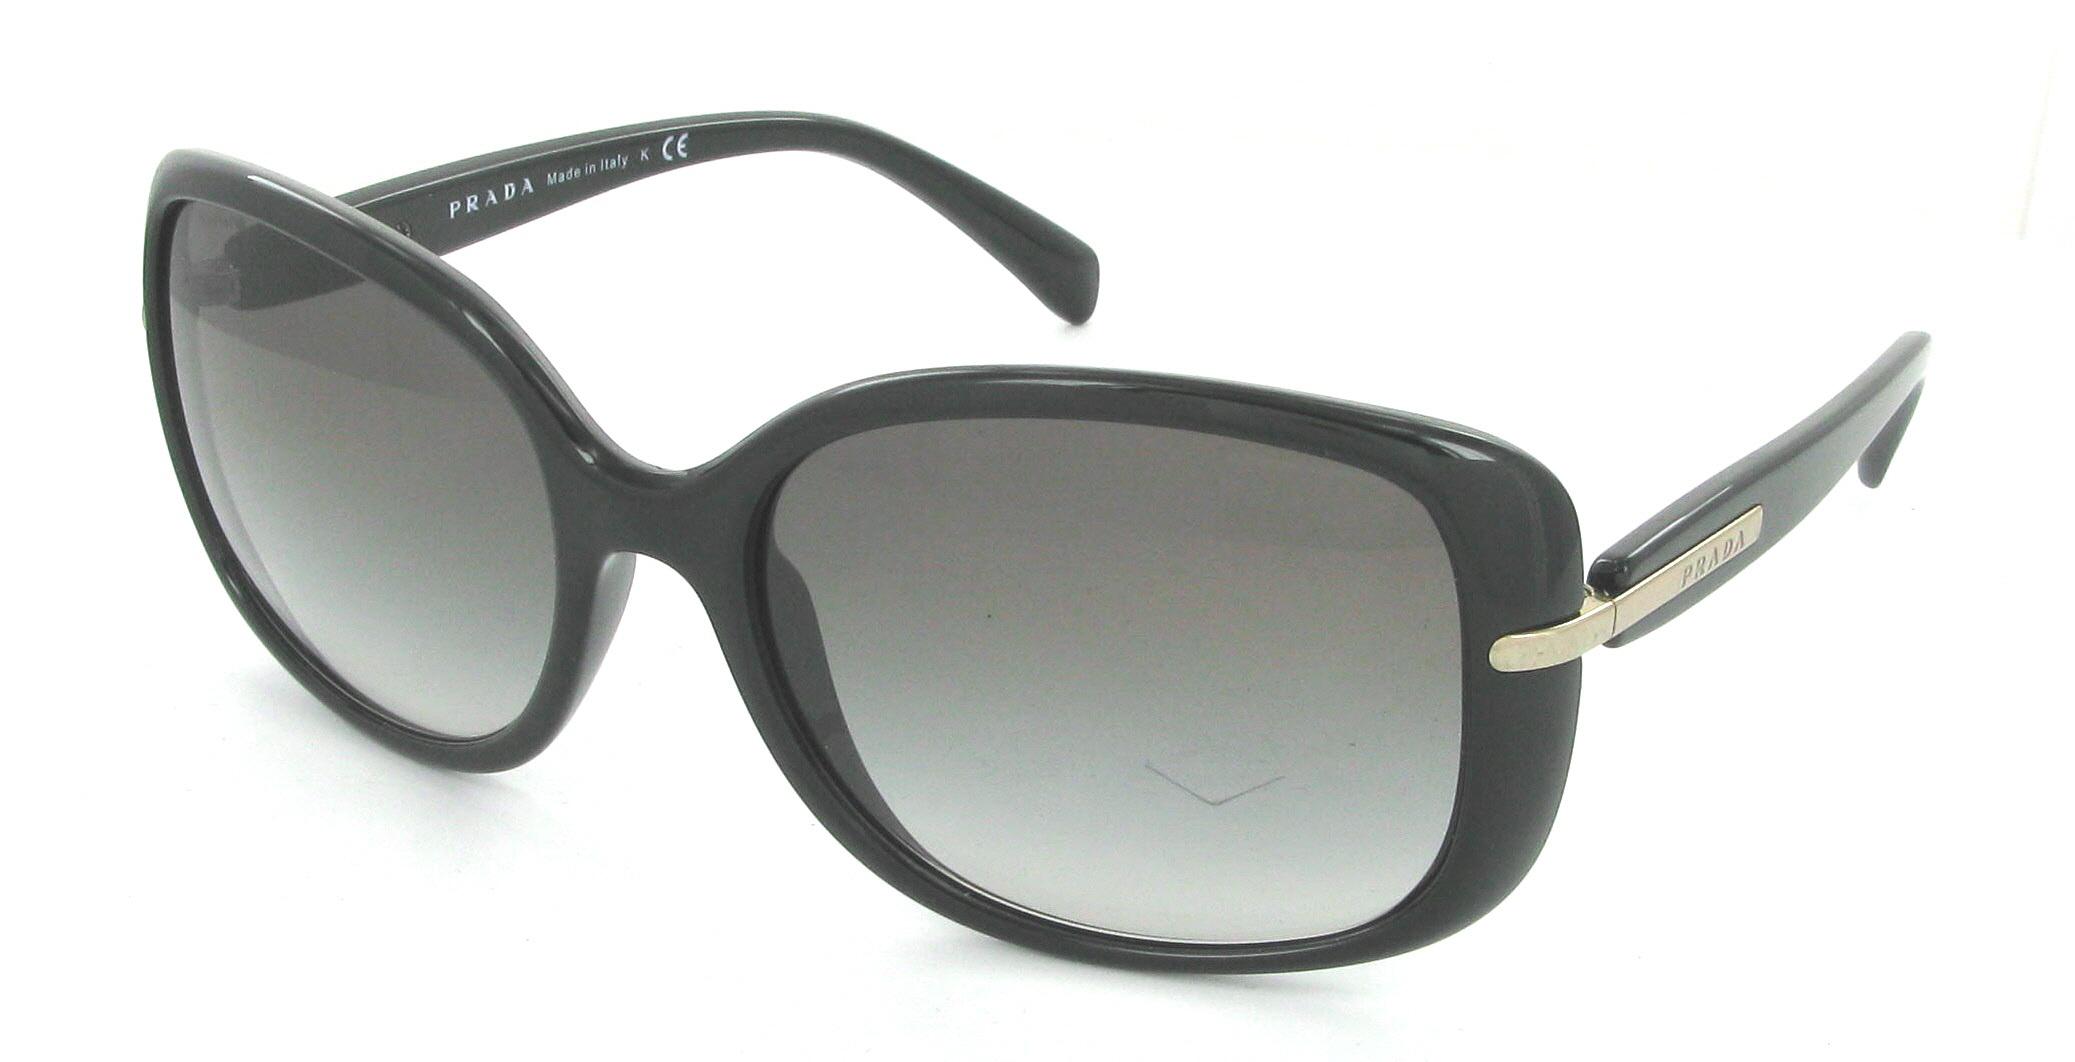 6f9ec95adbee59 lunette prada femme vue Deals   Sales pour mai 2017 - quintesauvage.fr